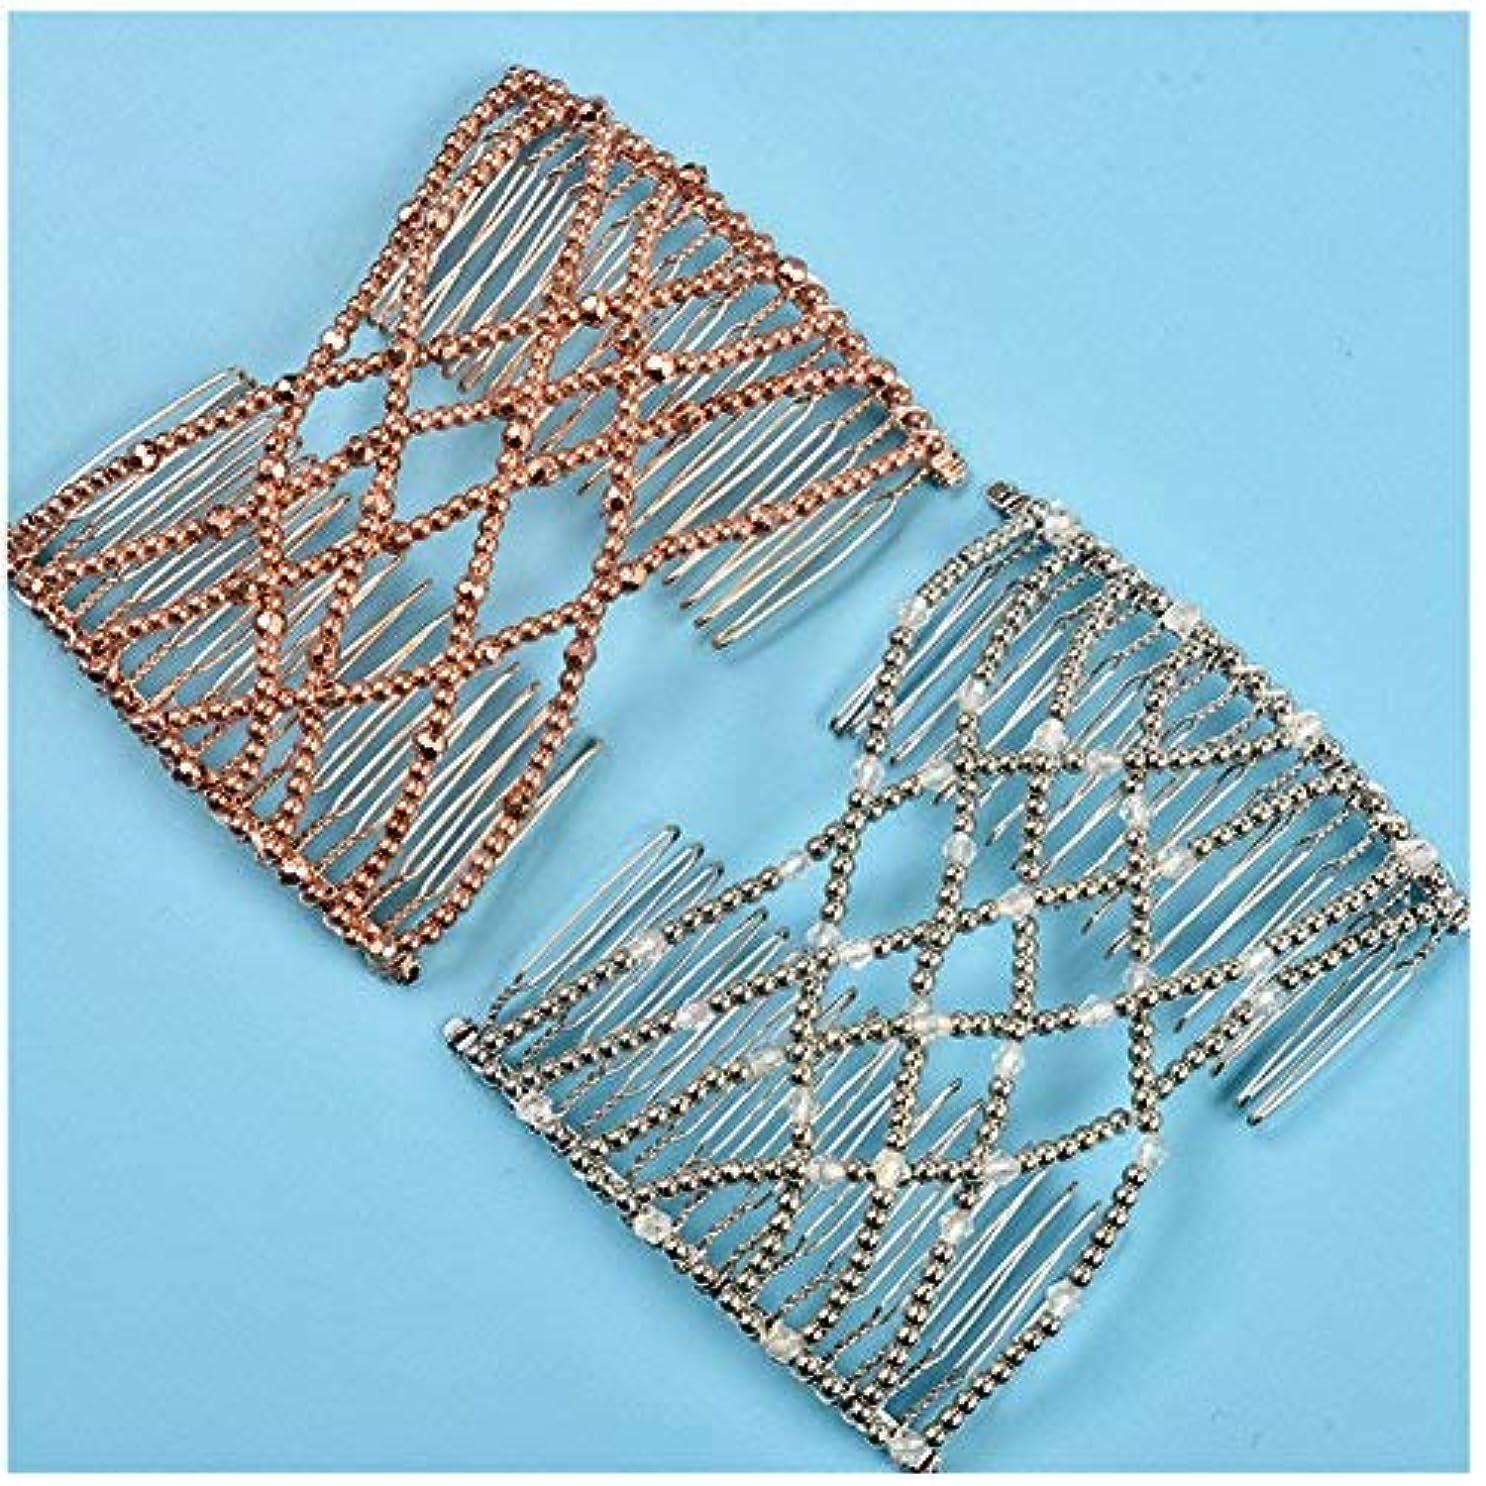 Lovef 2pcs Fashion Magic Beaded Elasticity Double Hair Comb Clip Stretchy Women Hair Accessories [並行輸入品]